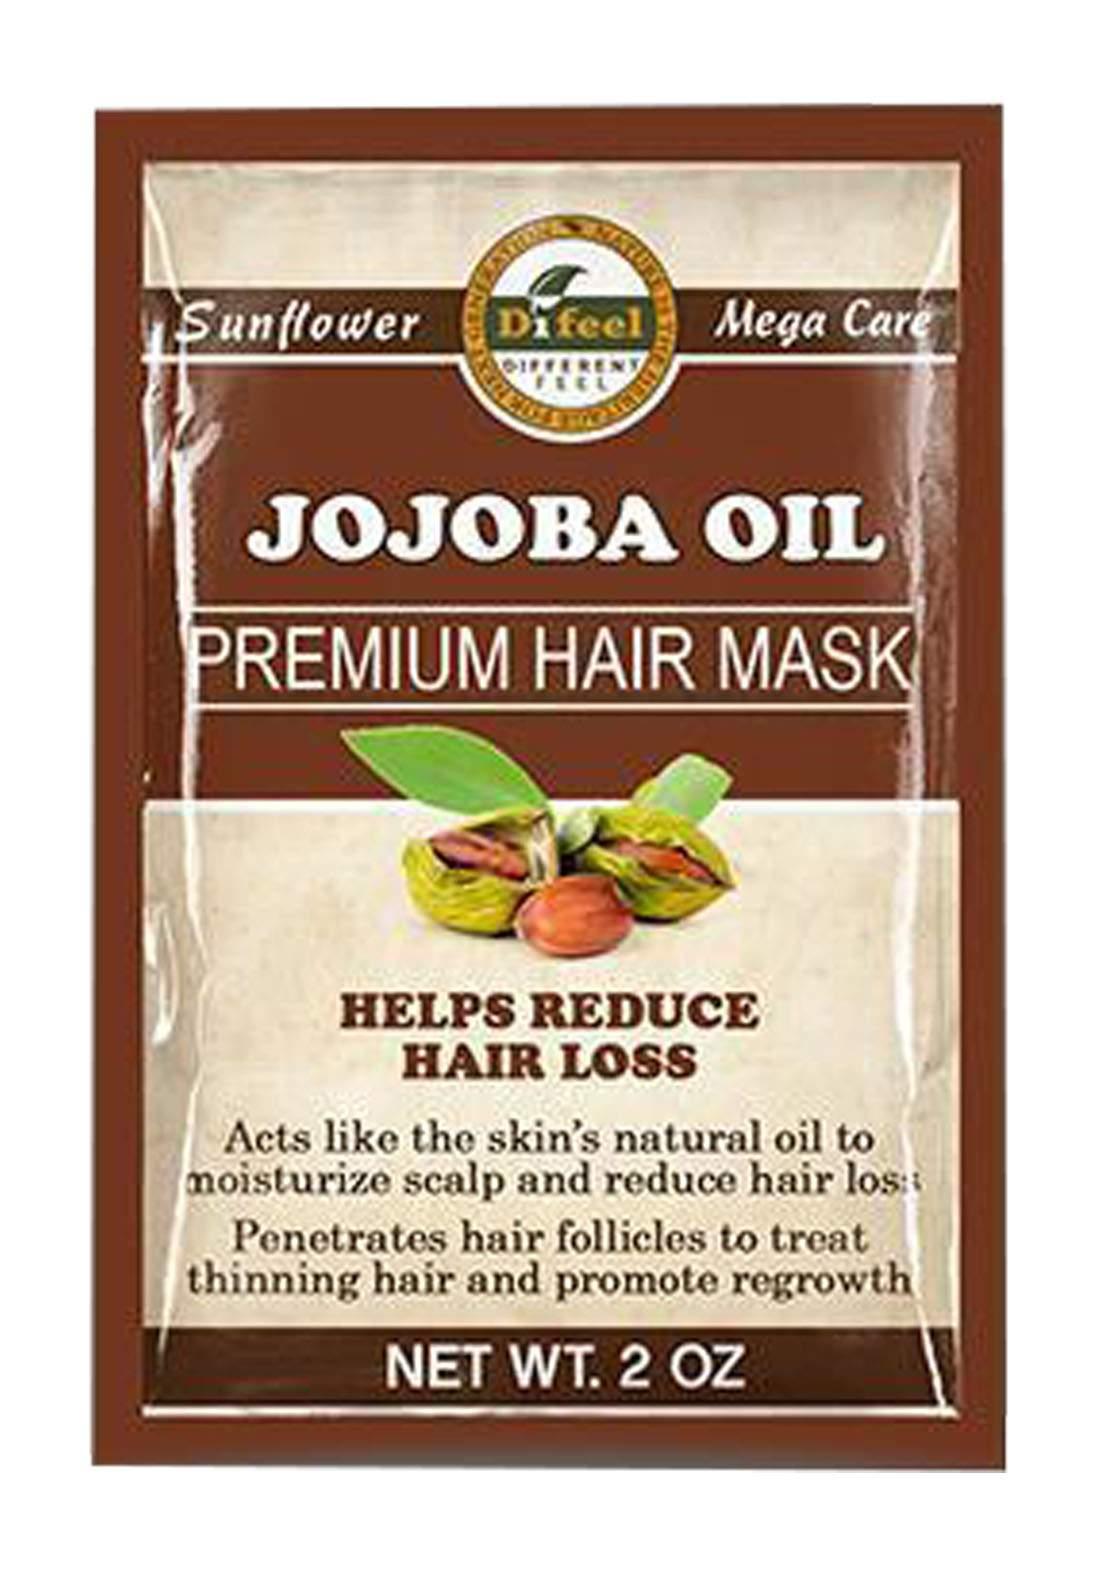 Difeel SH31_JOJ18 Sunflower Premium Hair Mask Jojoba Oil 50g  قناع للشعر